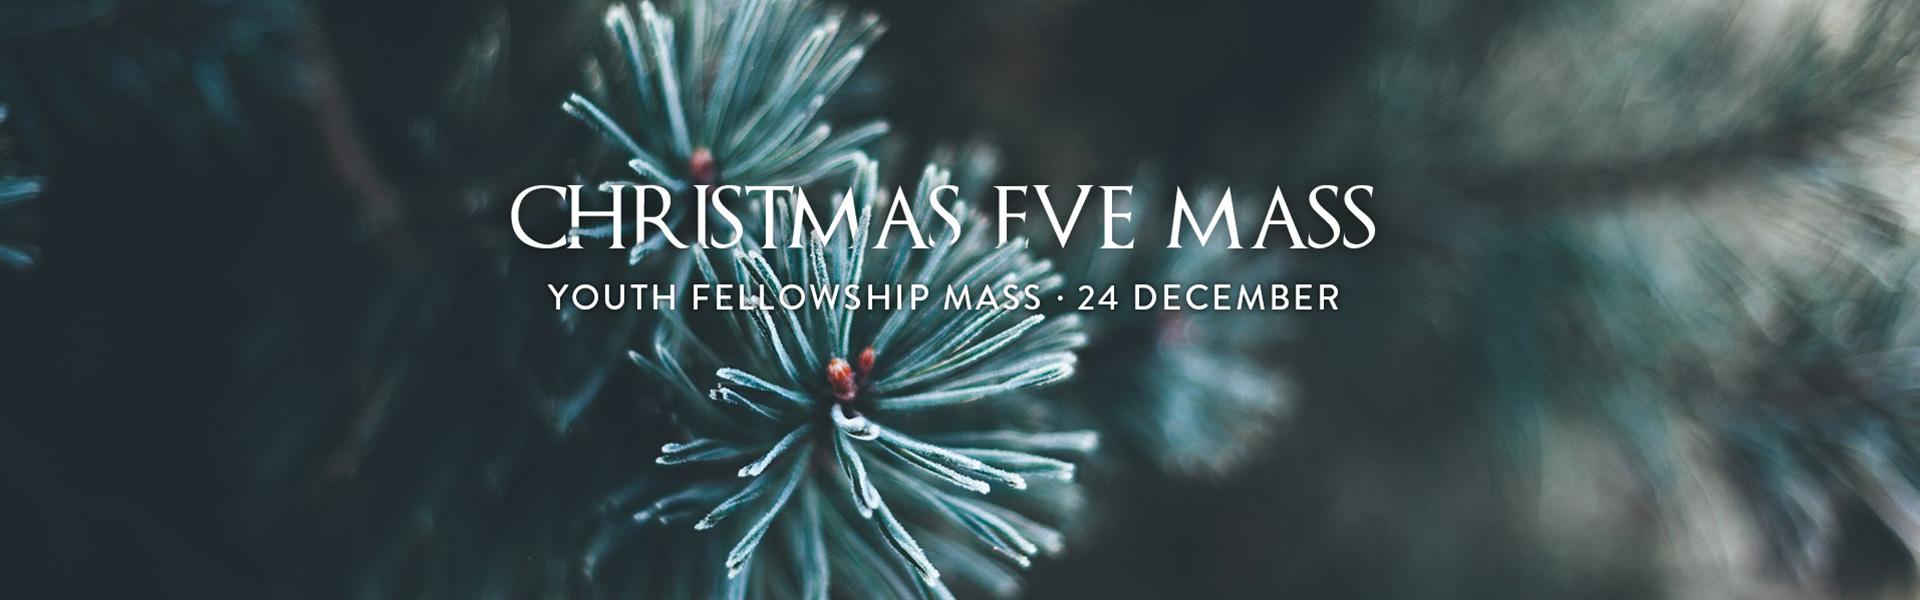 1224-ChristmasEveMass